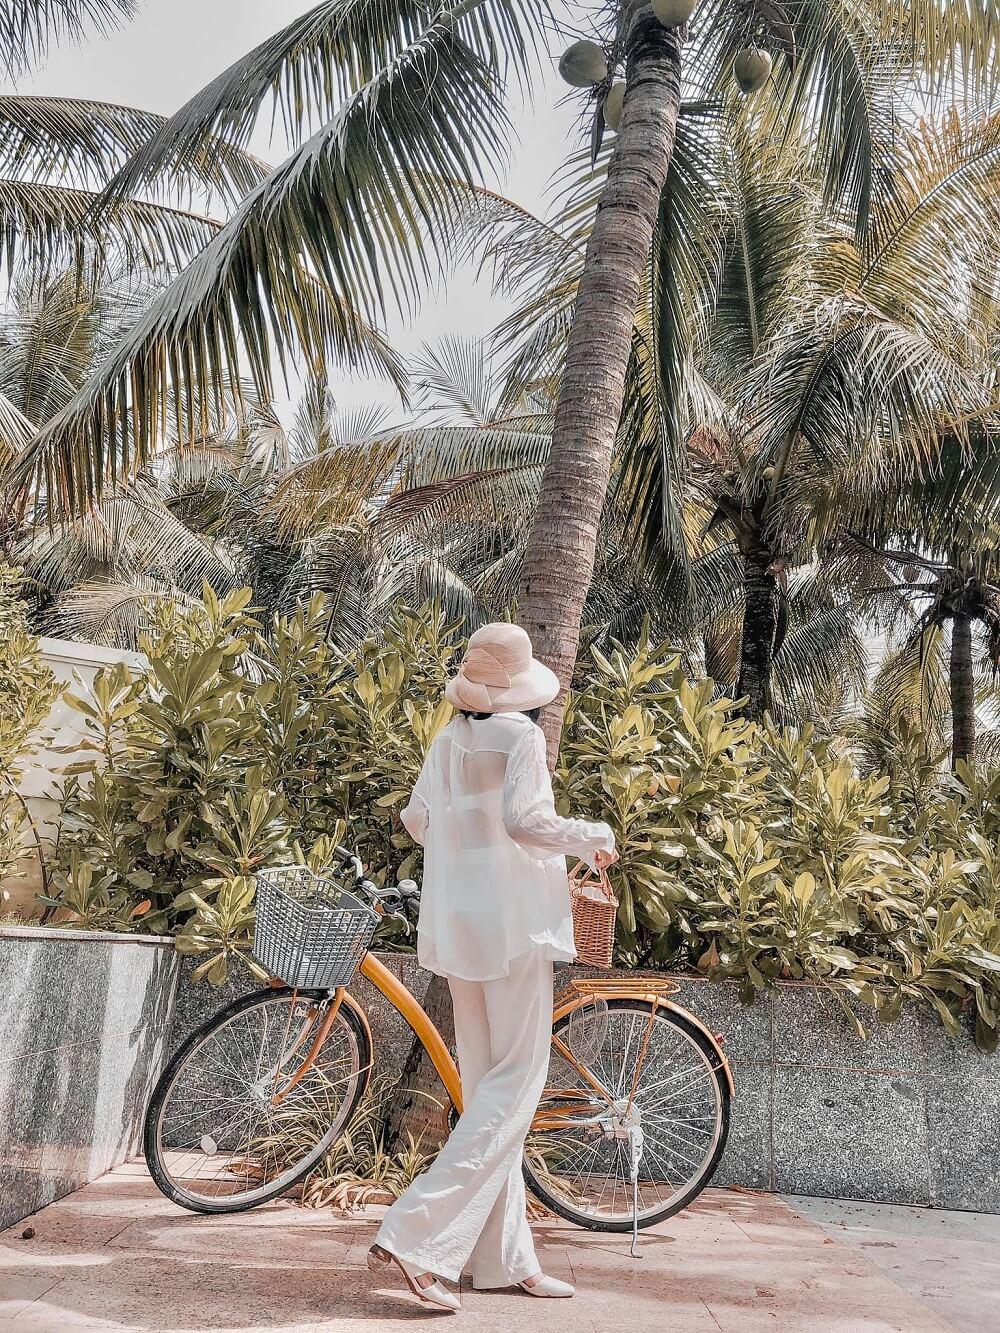 Premier Village Danang Resort Managed By Accorhotels Review Kinh Nghiem Du Lich Da Nang Cho Gia Dinh Co Con Nho Danang Fantasticity Com 01